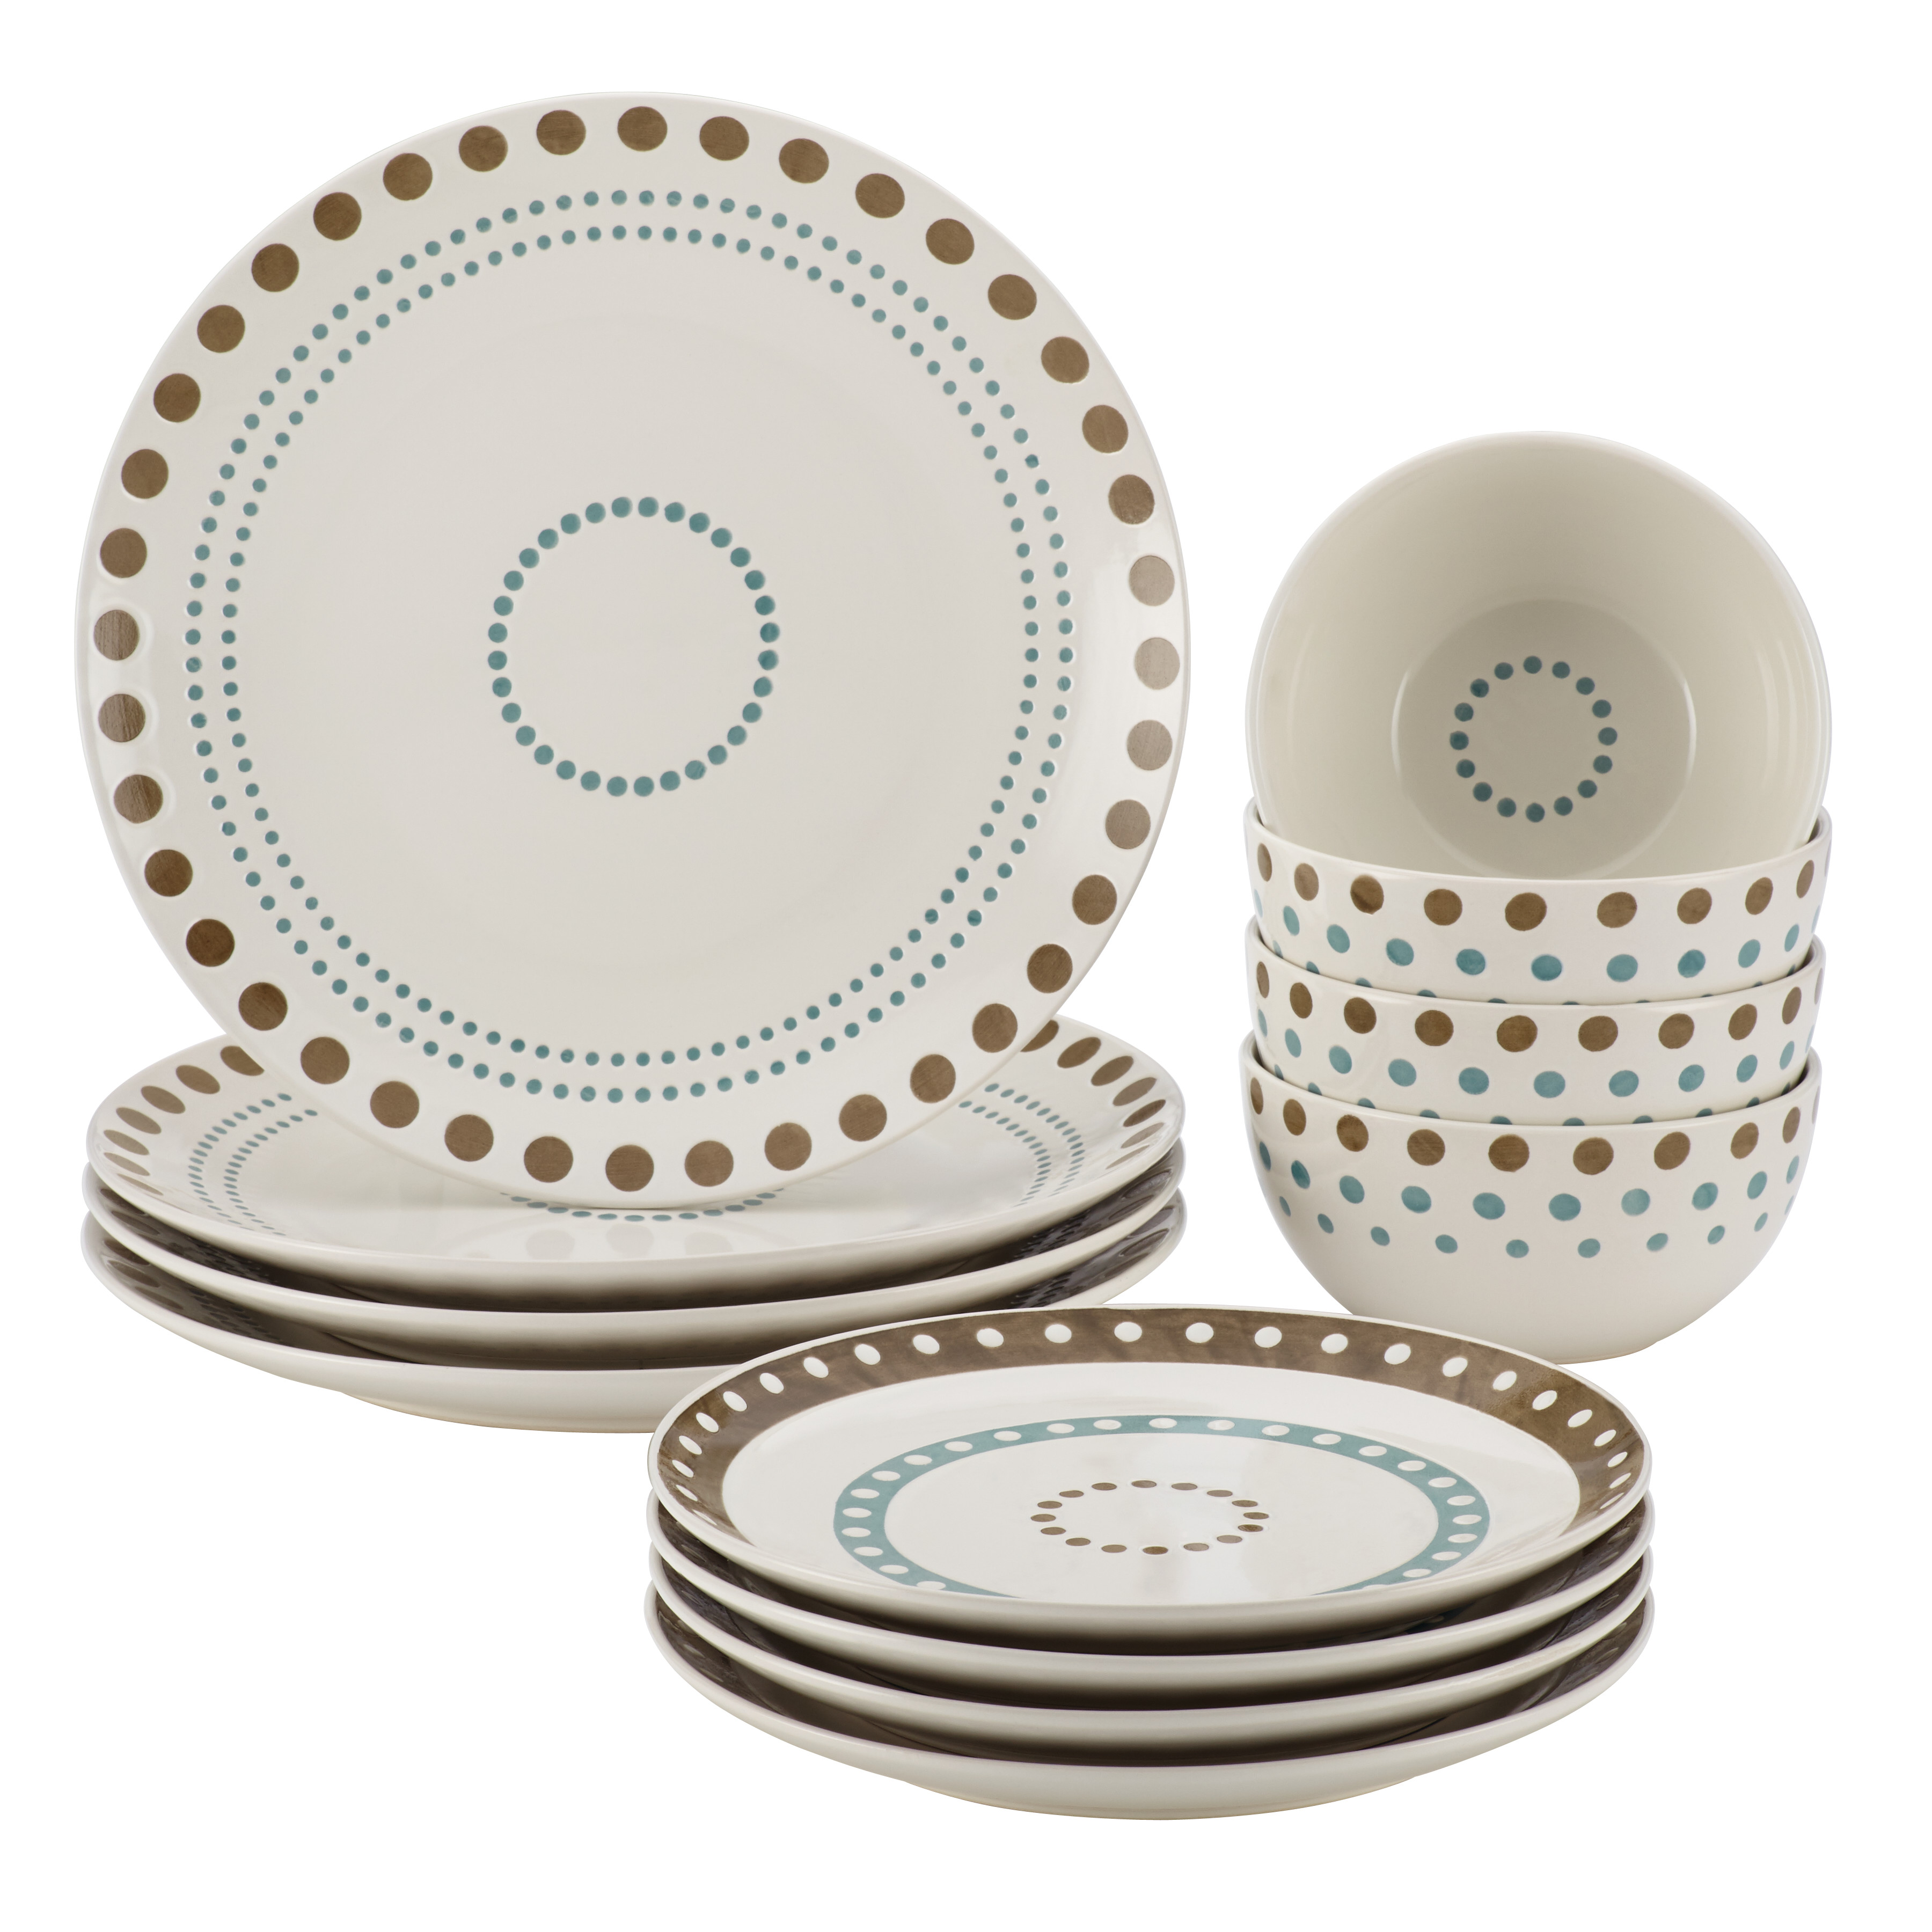 Rachael Ray Cucina Circles and Dots 12-Piece Stoneware Dinnerware Set